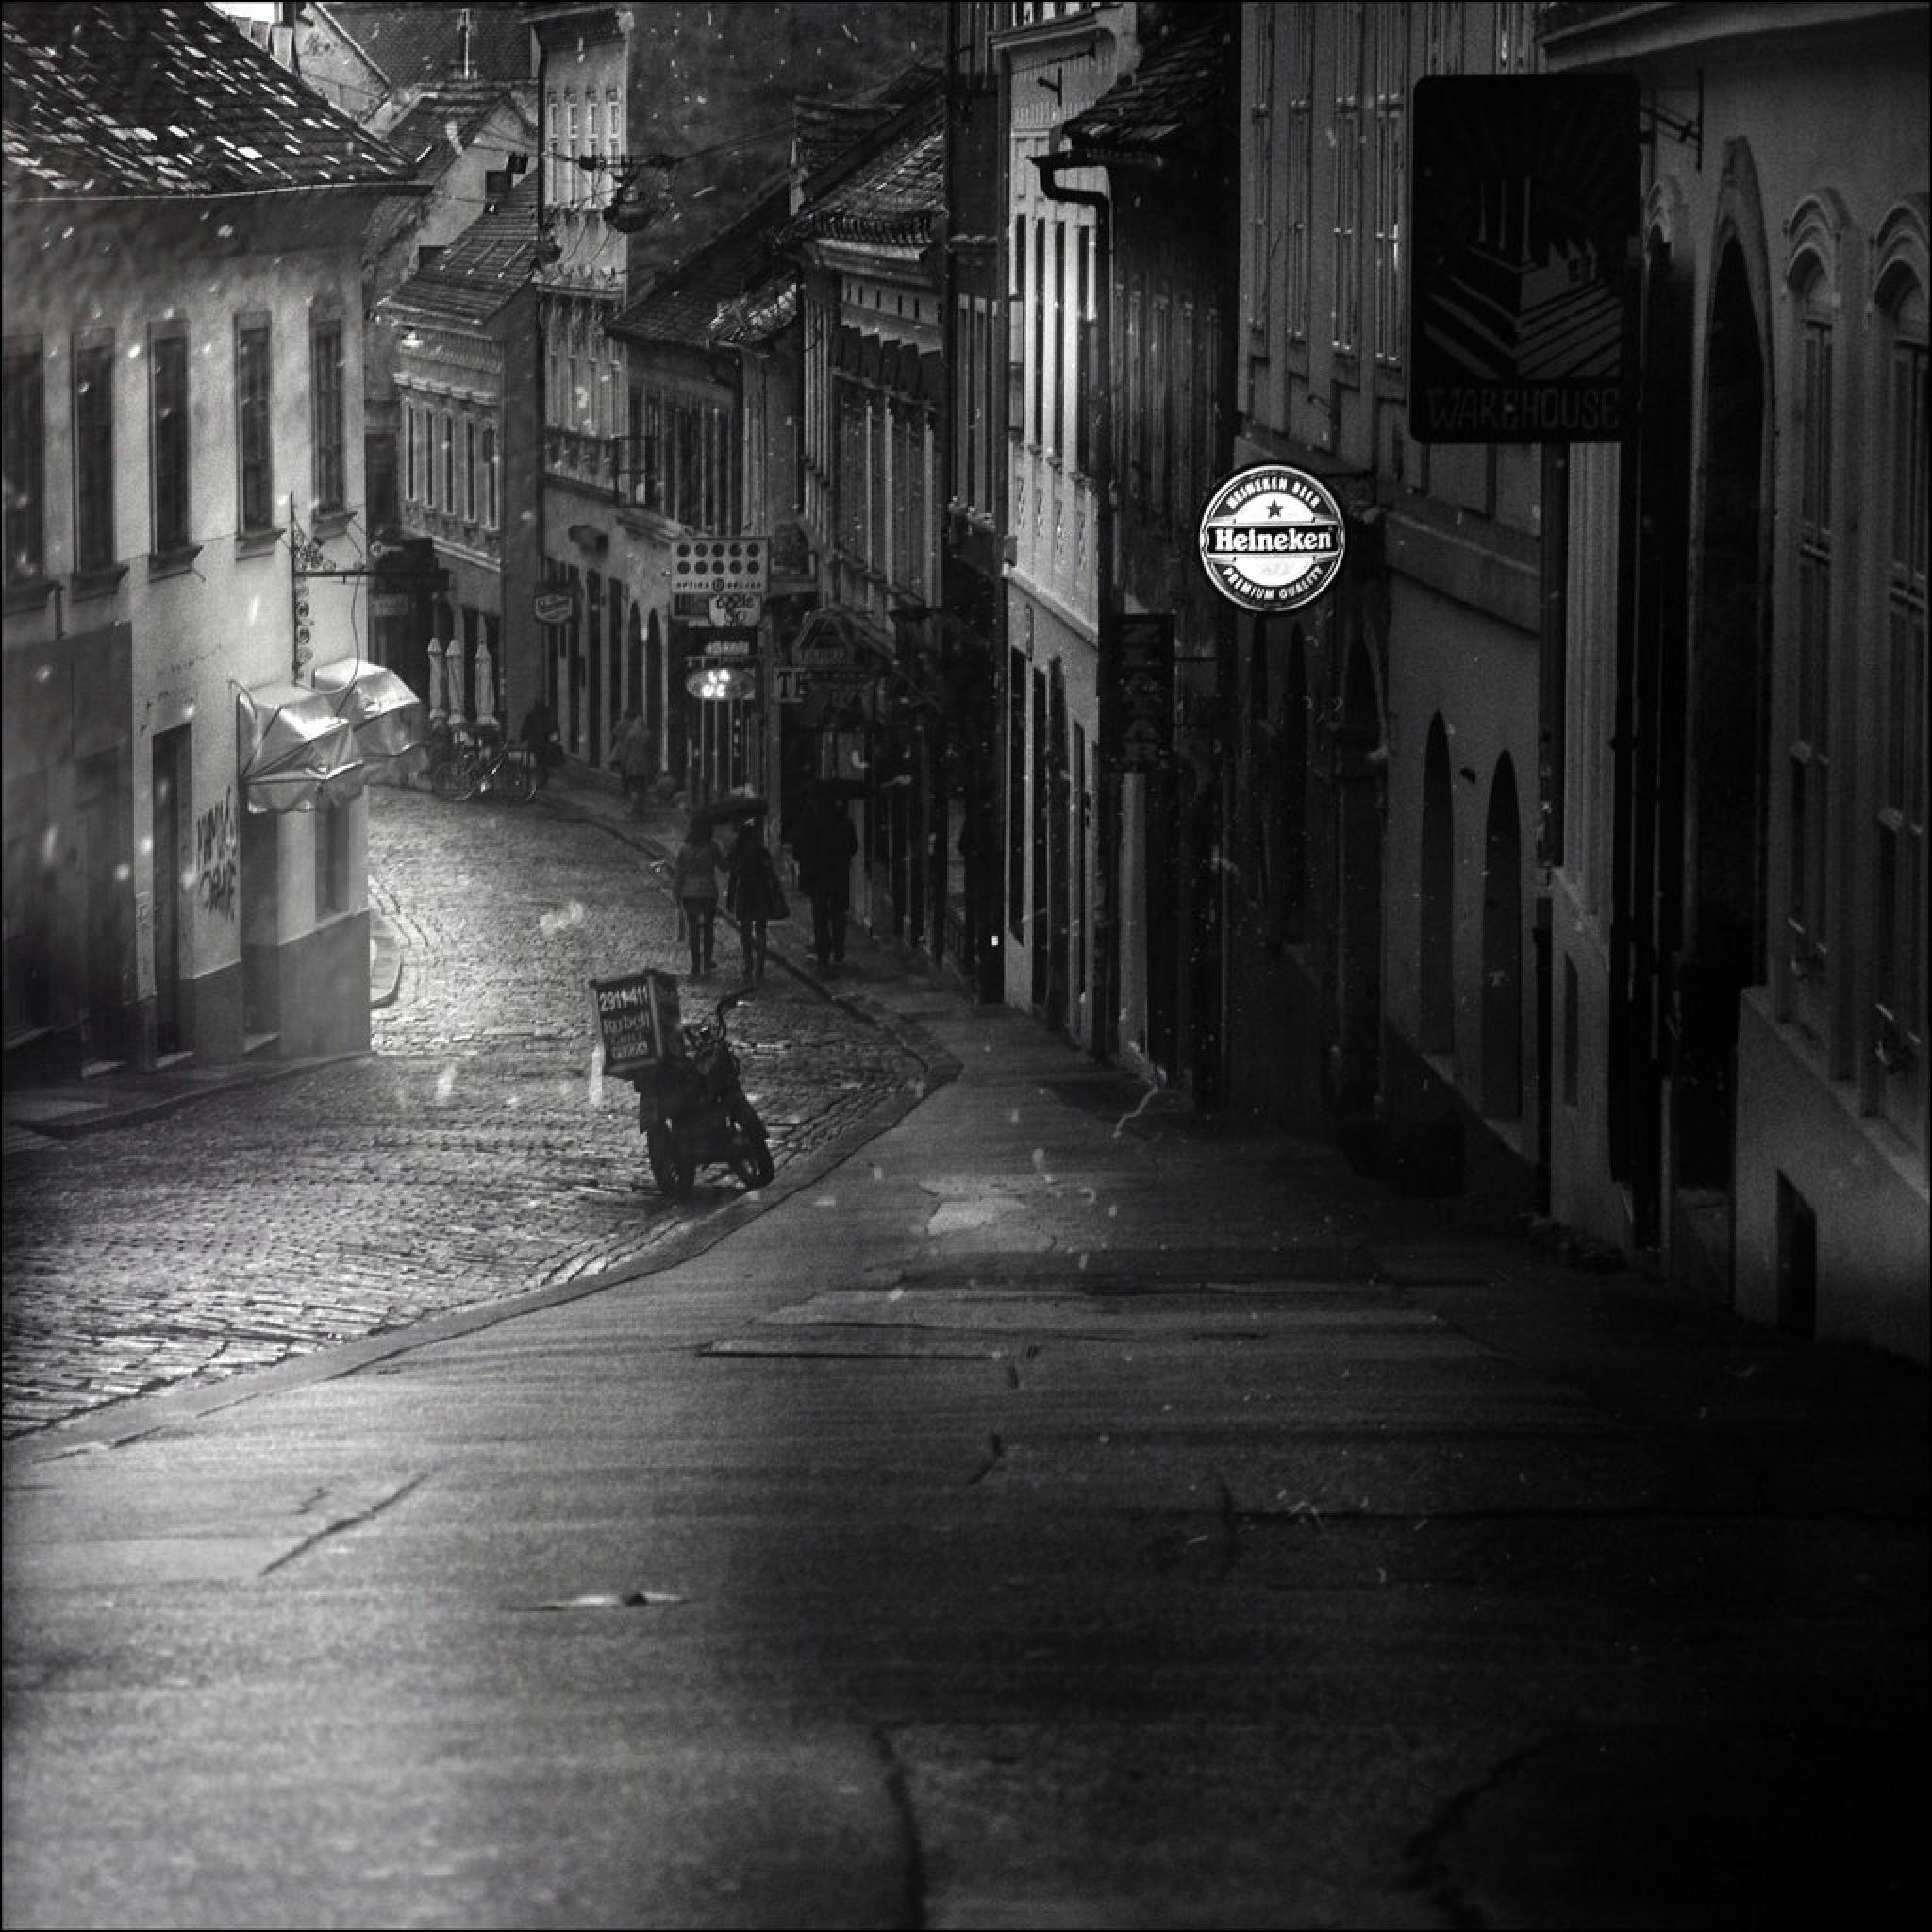 Zagreb by Vesna Stojkovic